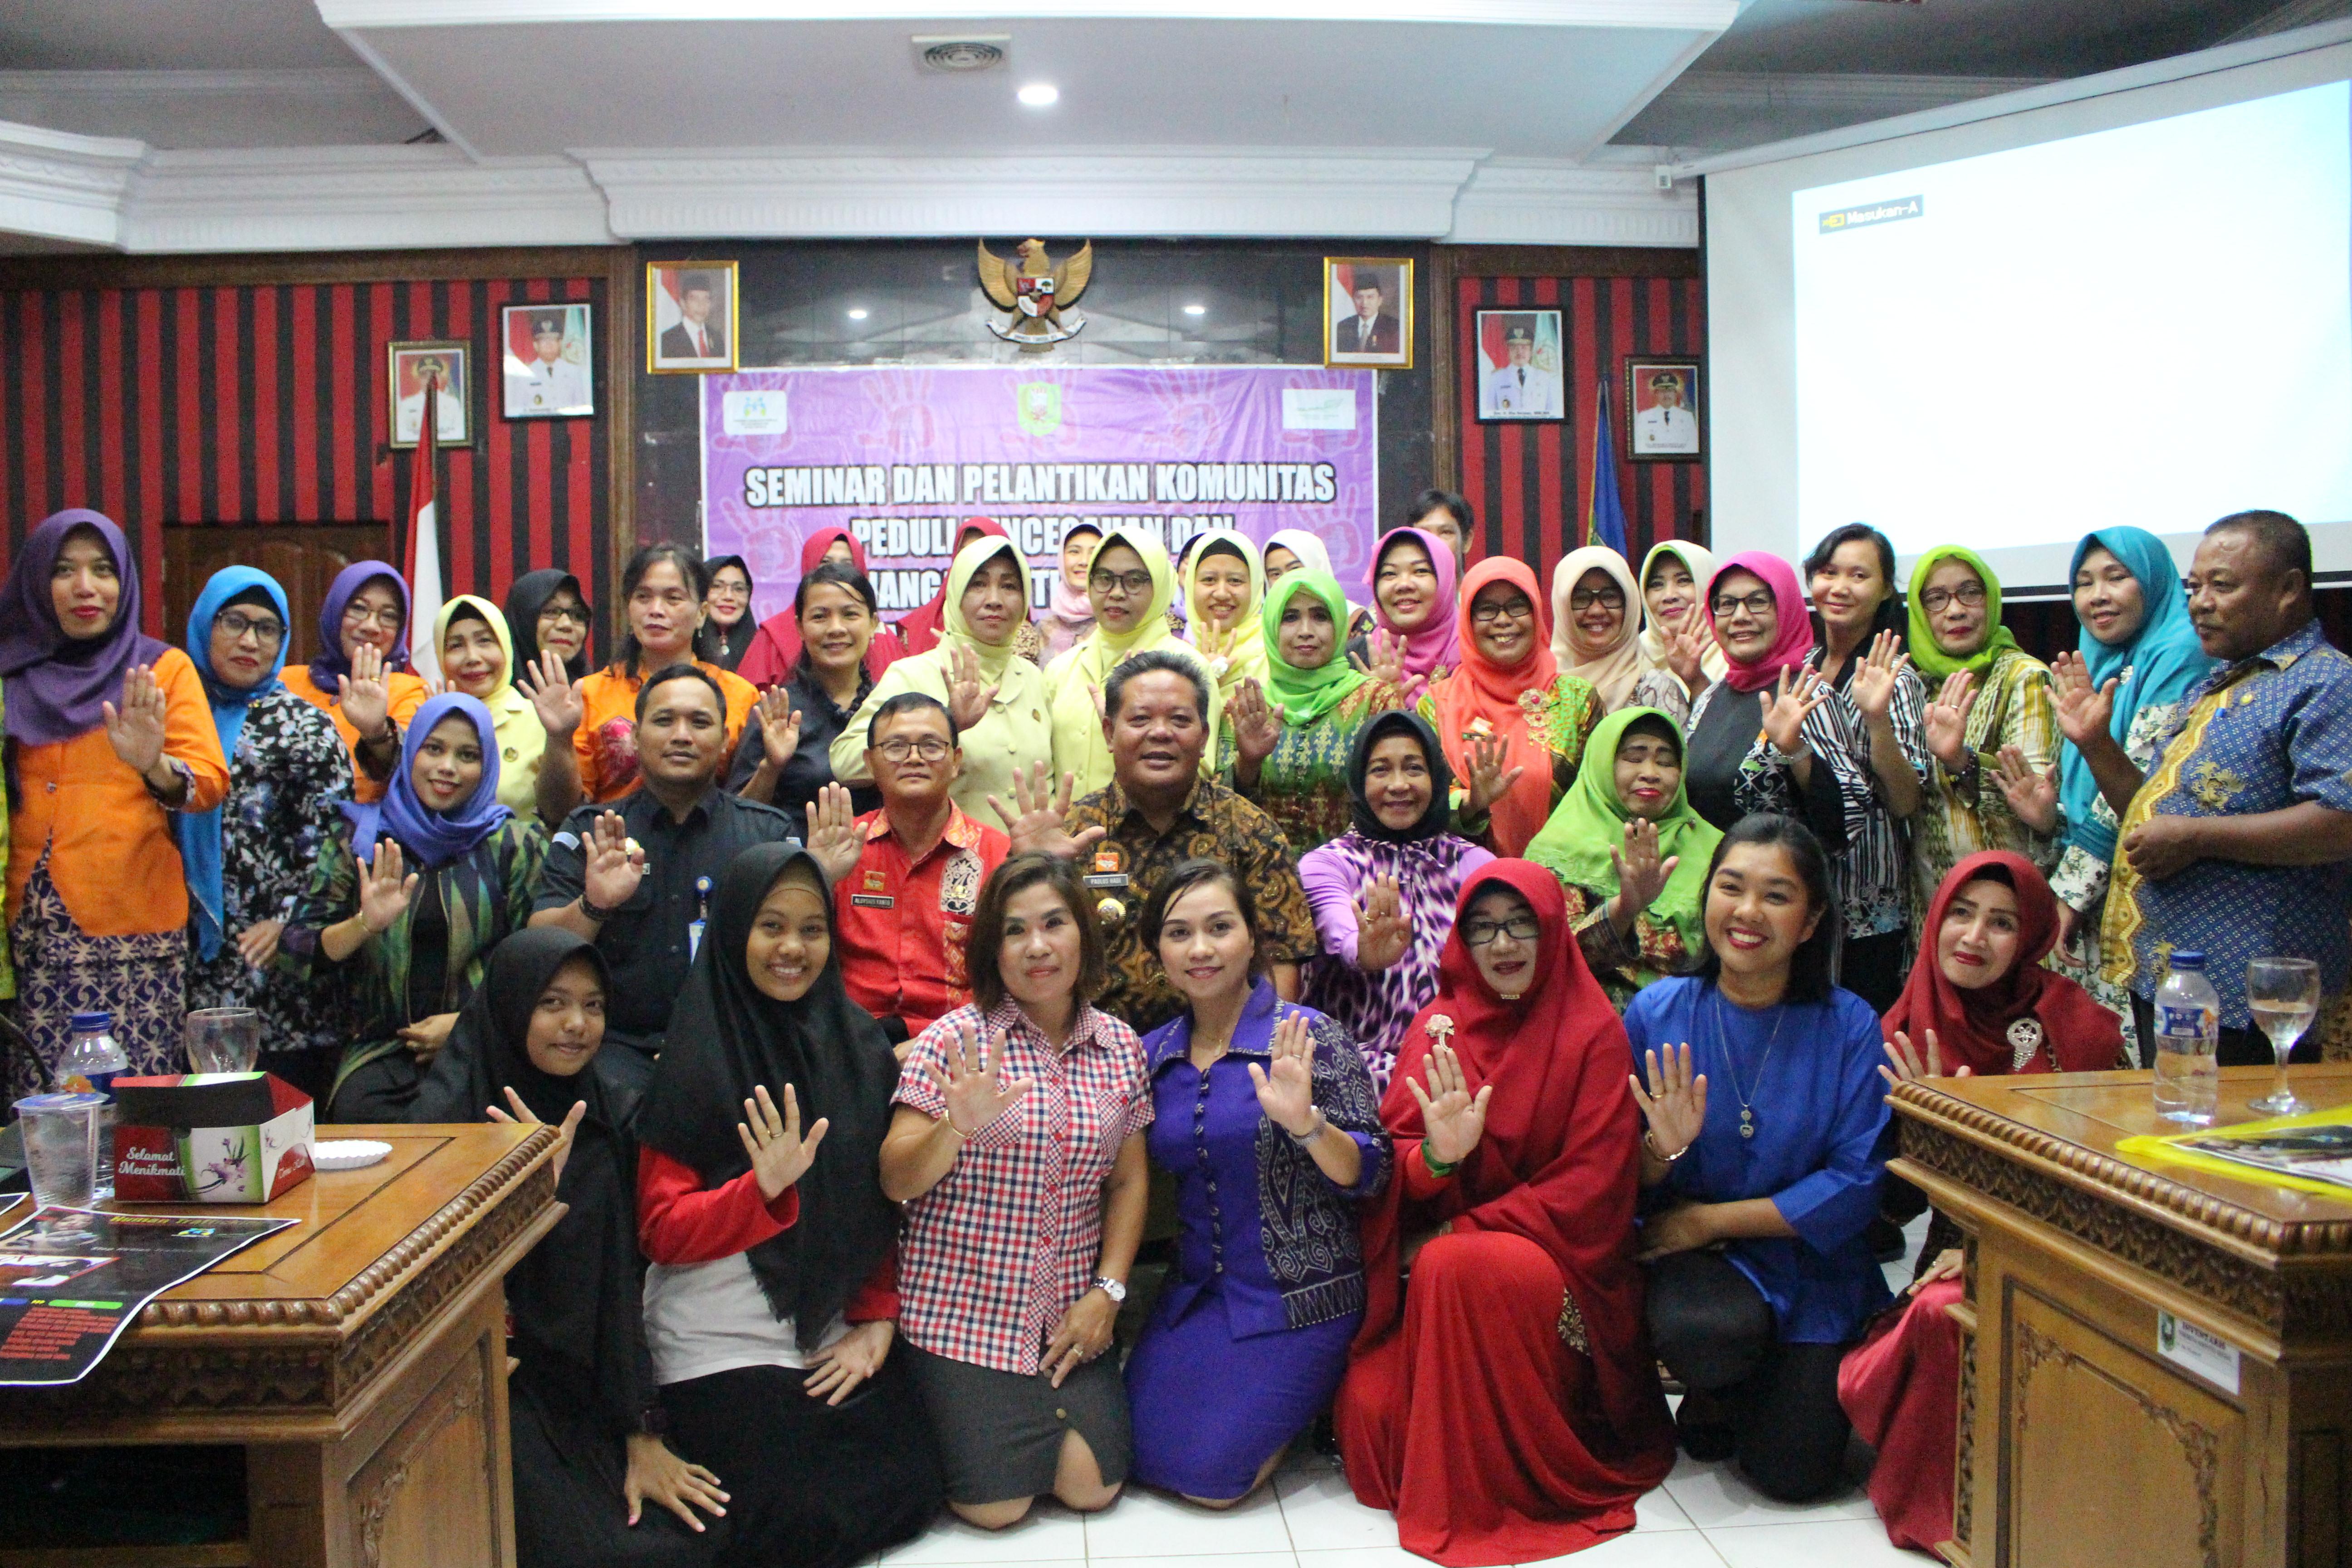 Bupati: Kita Cegah Tindak Pidana Perdagangan Orang di Kabupaten Sanggau